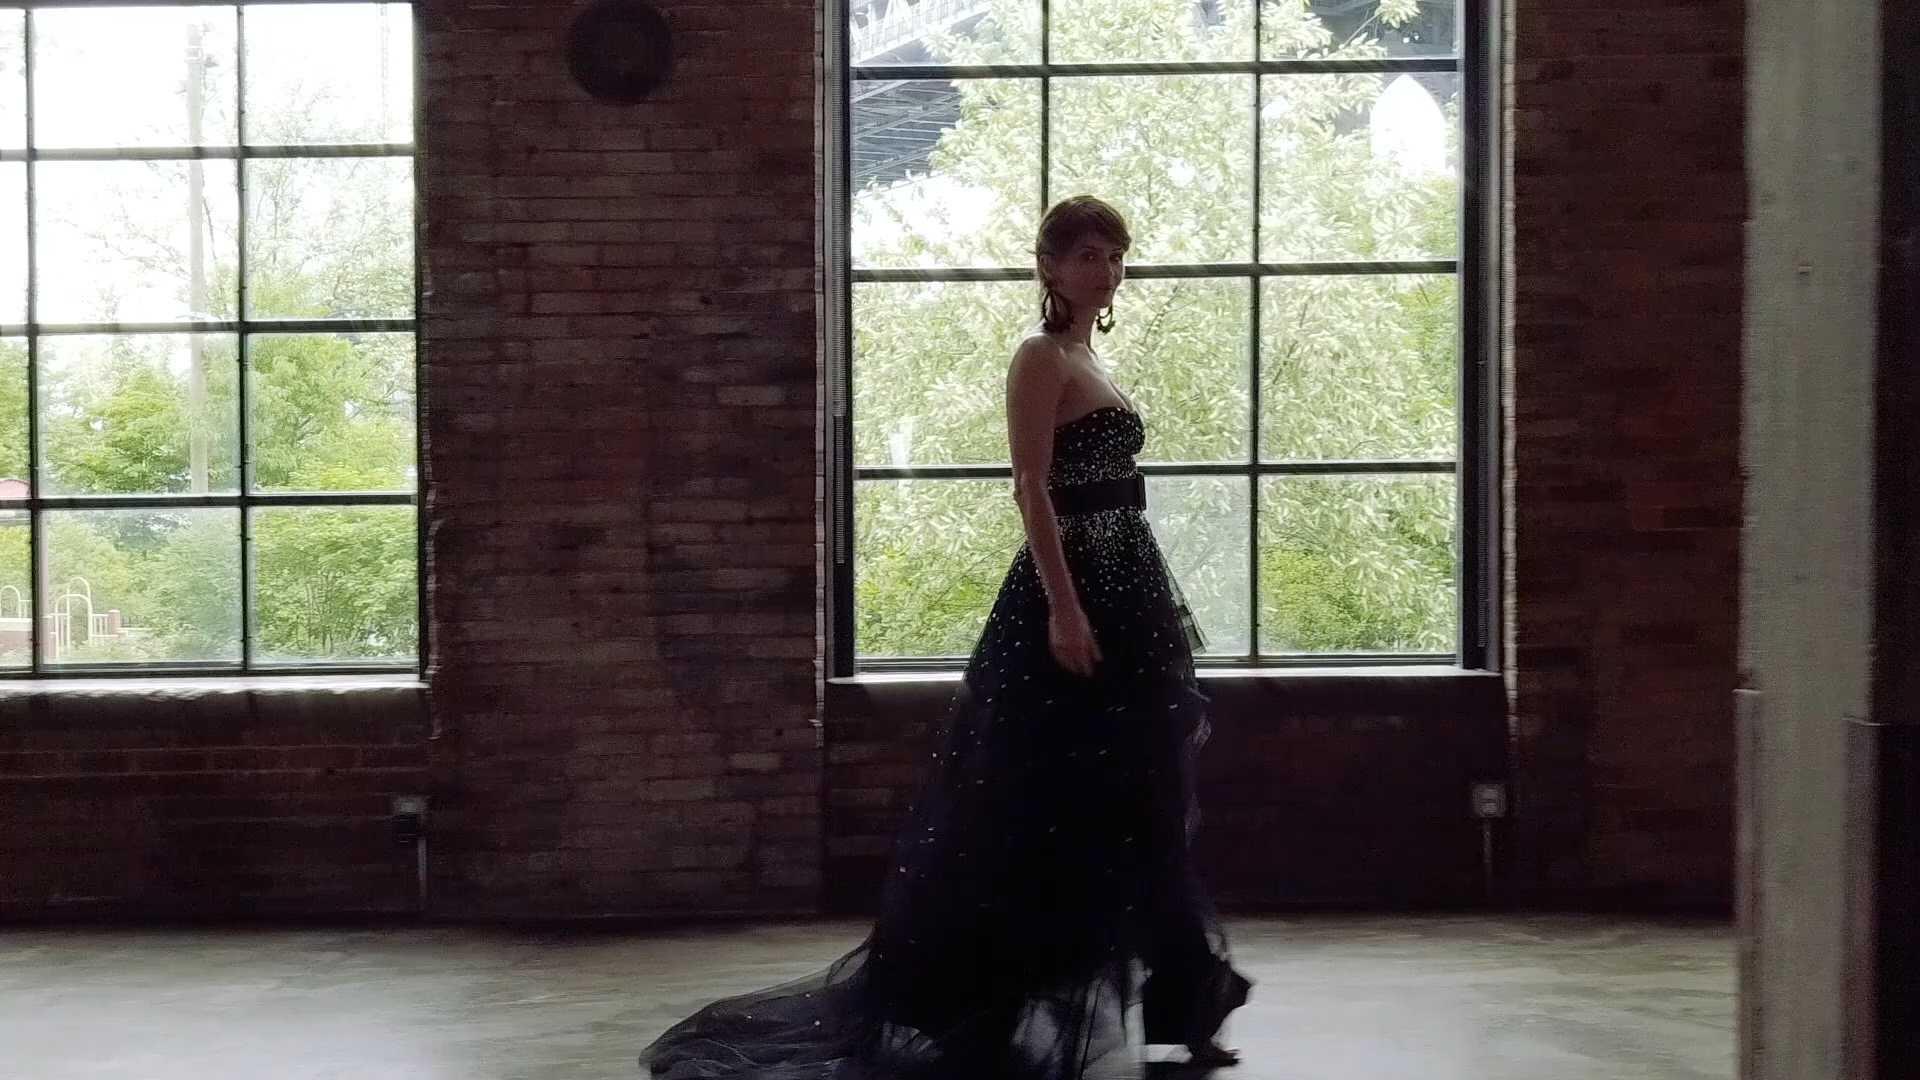 Drone Fashion Video cover image